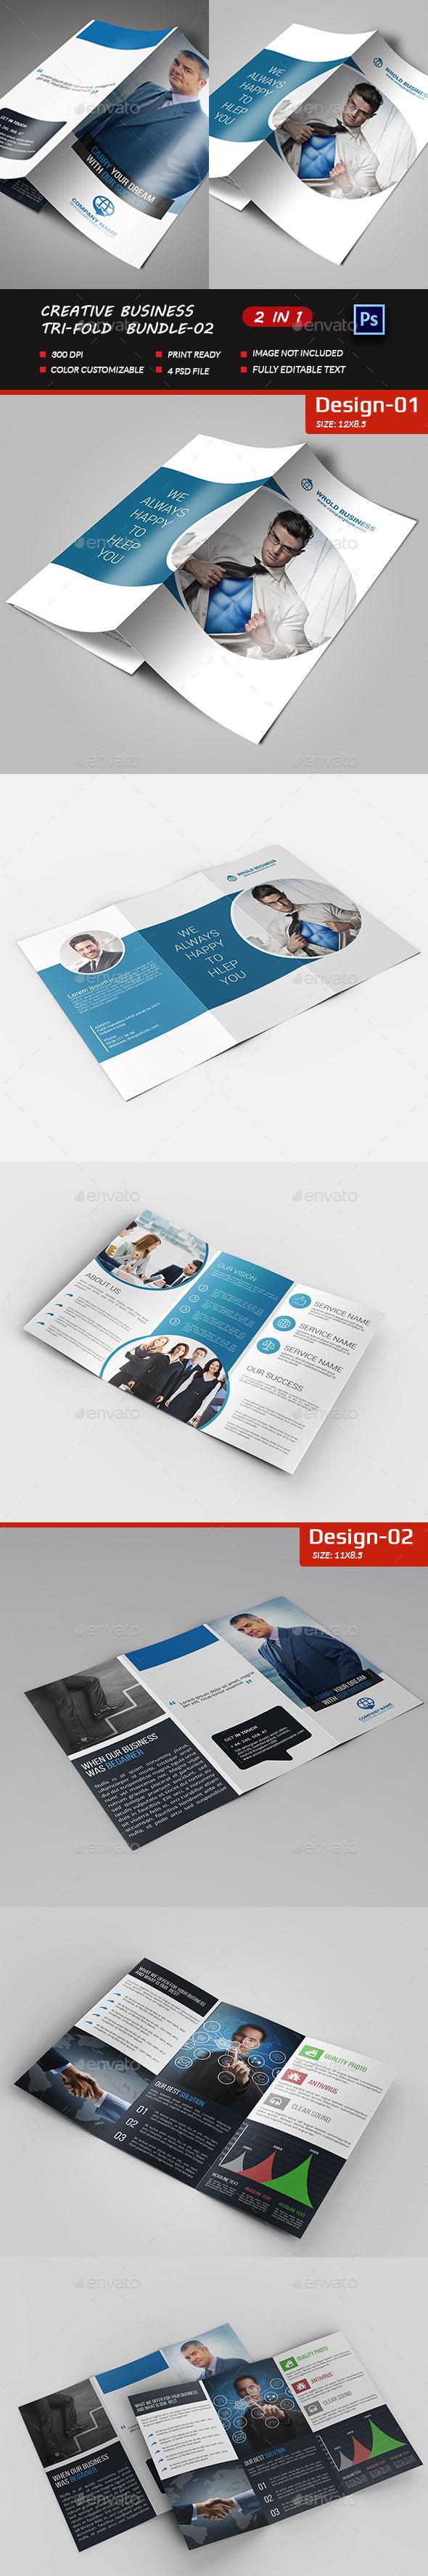 Corporate Business Tri-fold-Bundle-02 - Brochures Print Templates